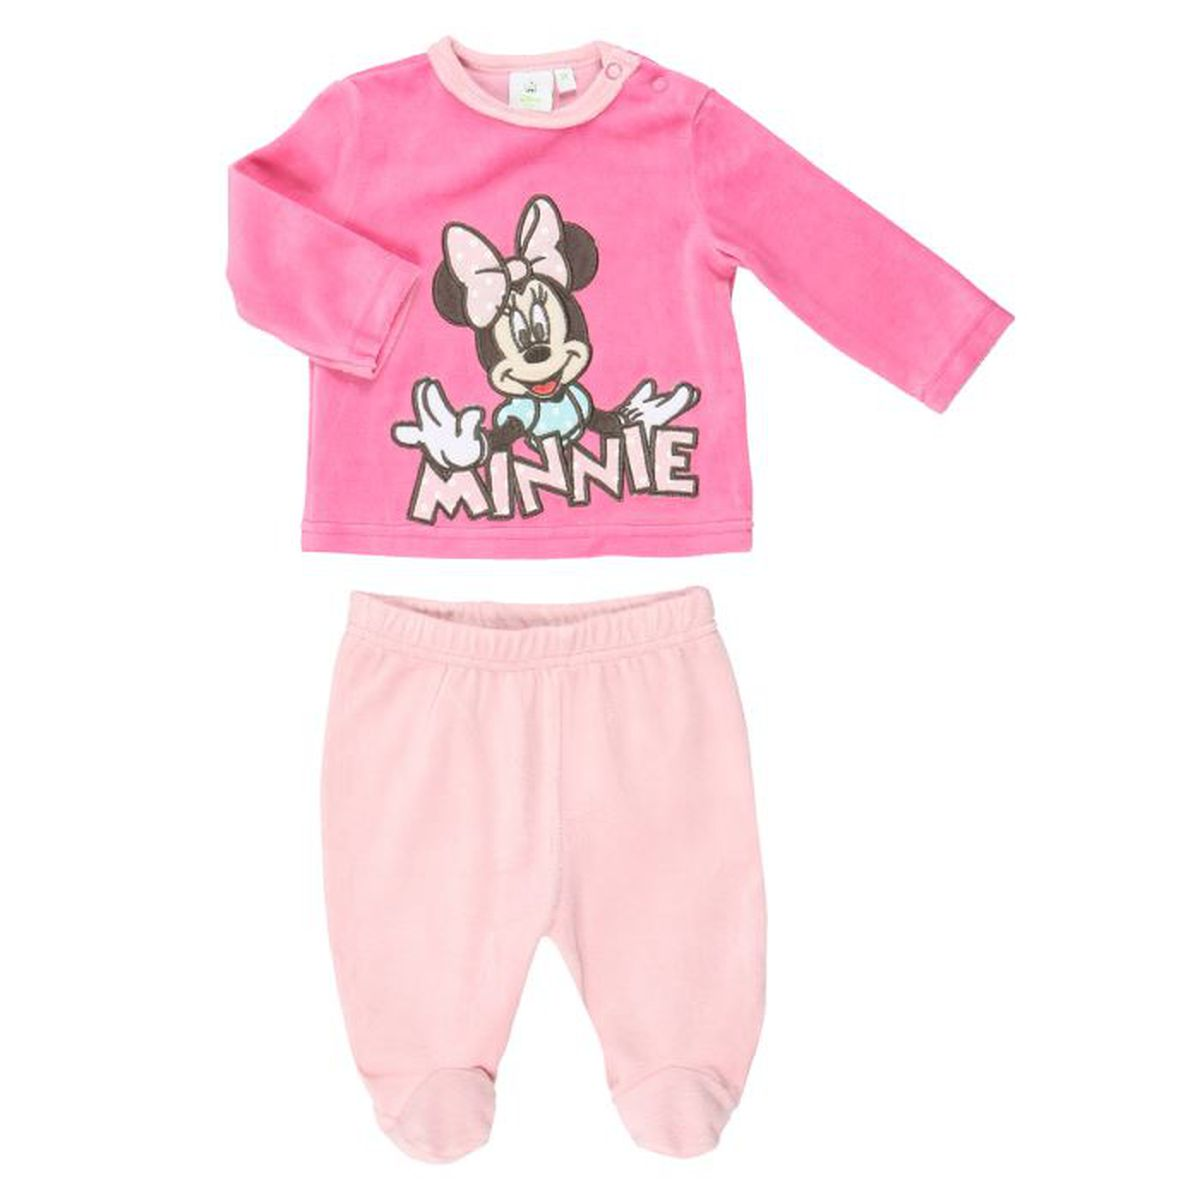 minnie pyjama velours b b fille fuschia et rose achat. Black Bedroom Furniture Sets. Home Design Ideas